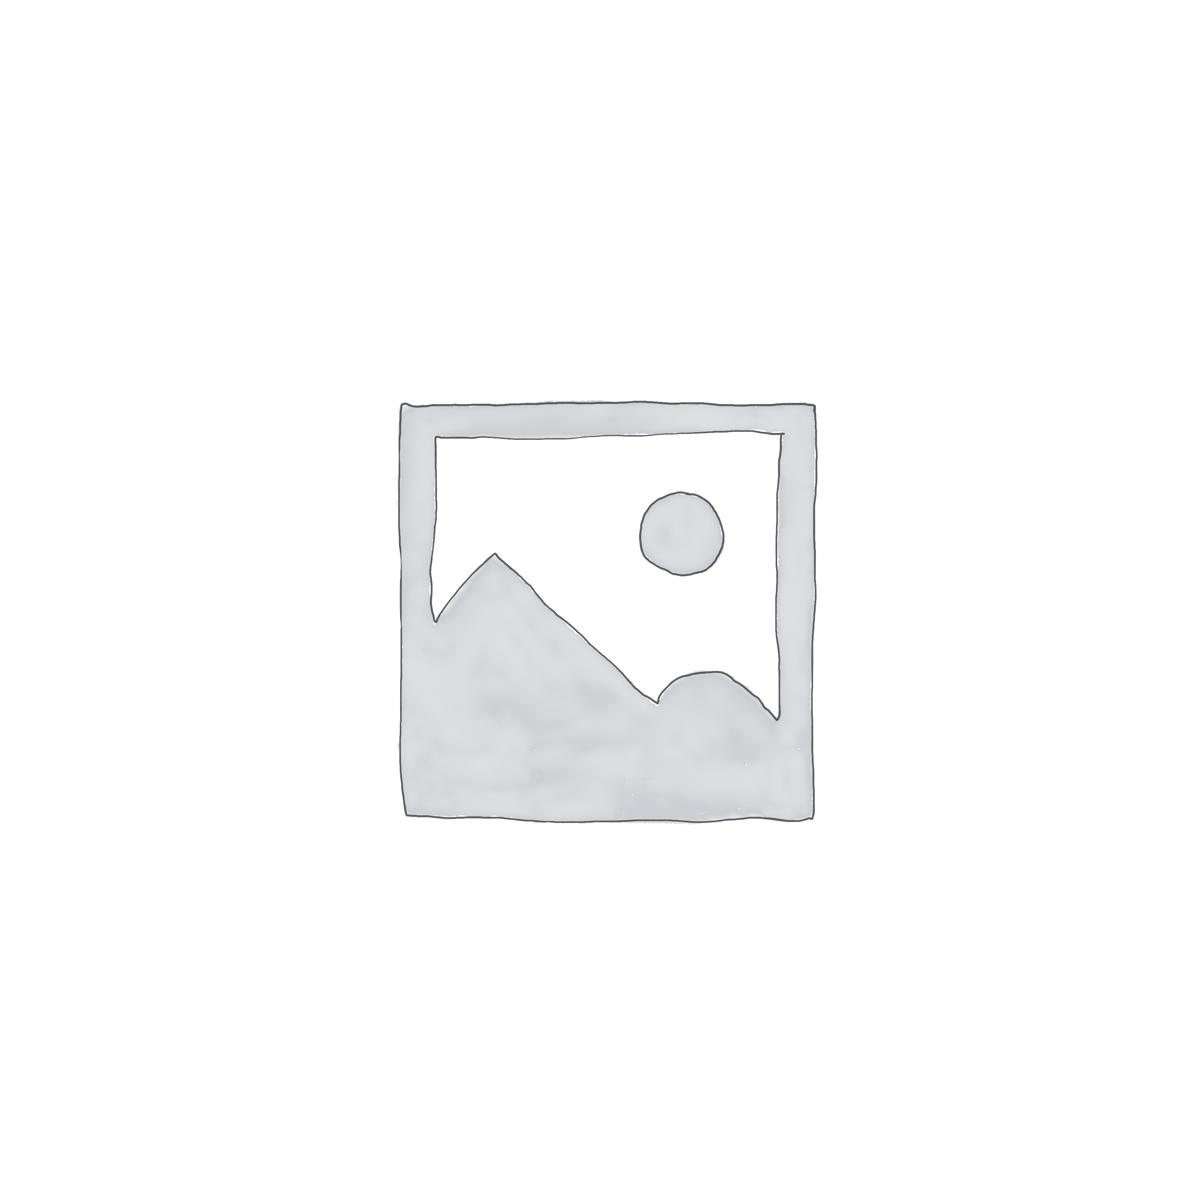 Dark Misty Forest with Horned Deer Wallpaper Mural